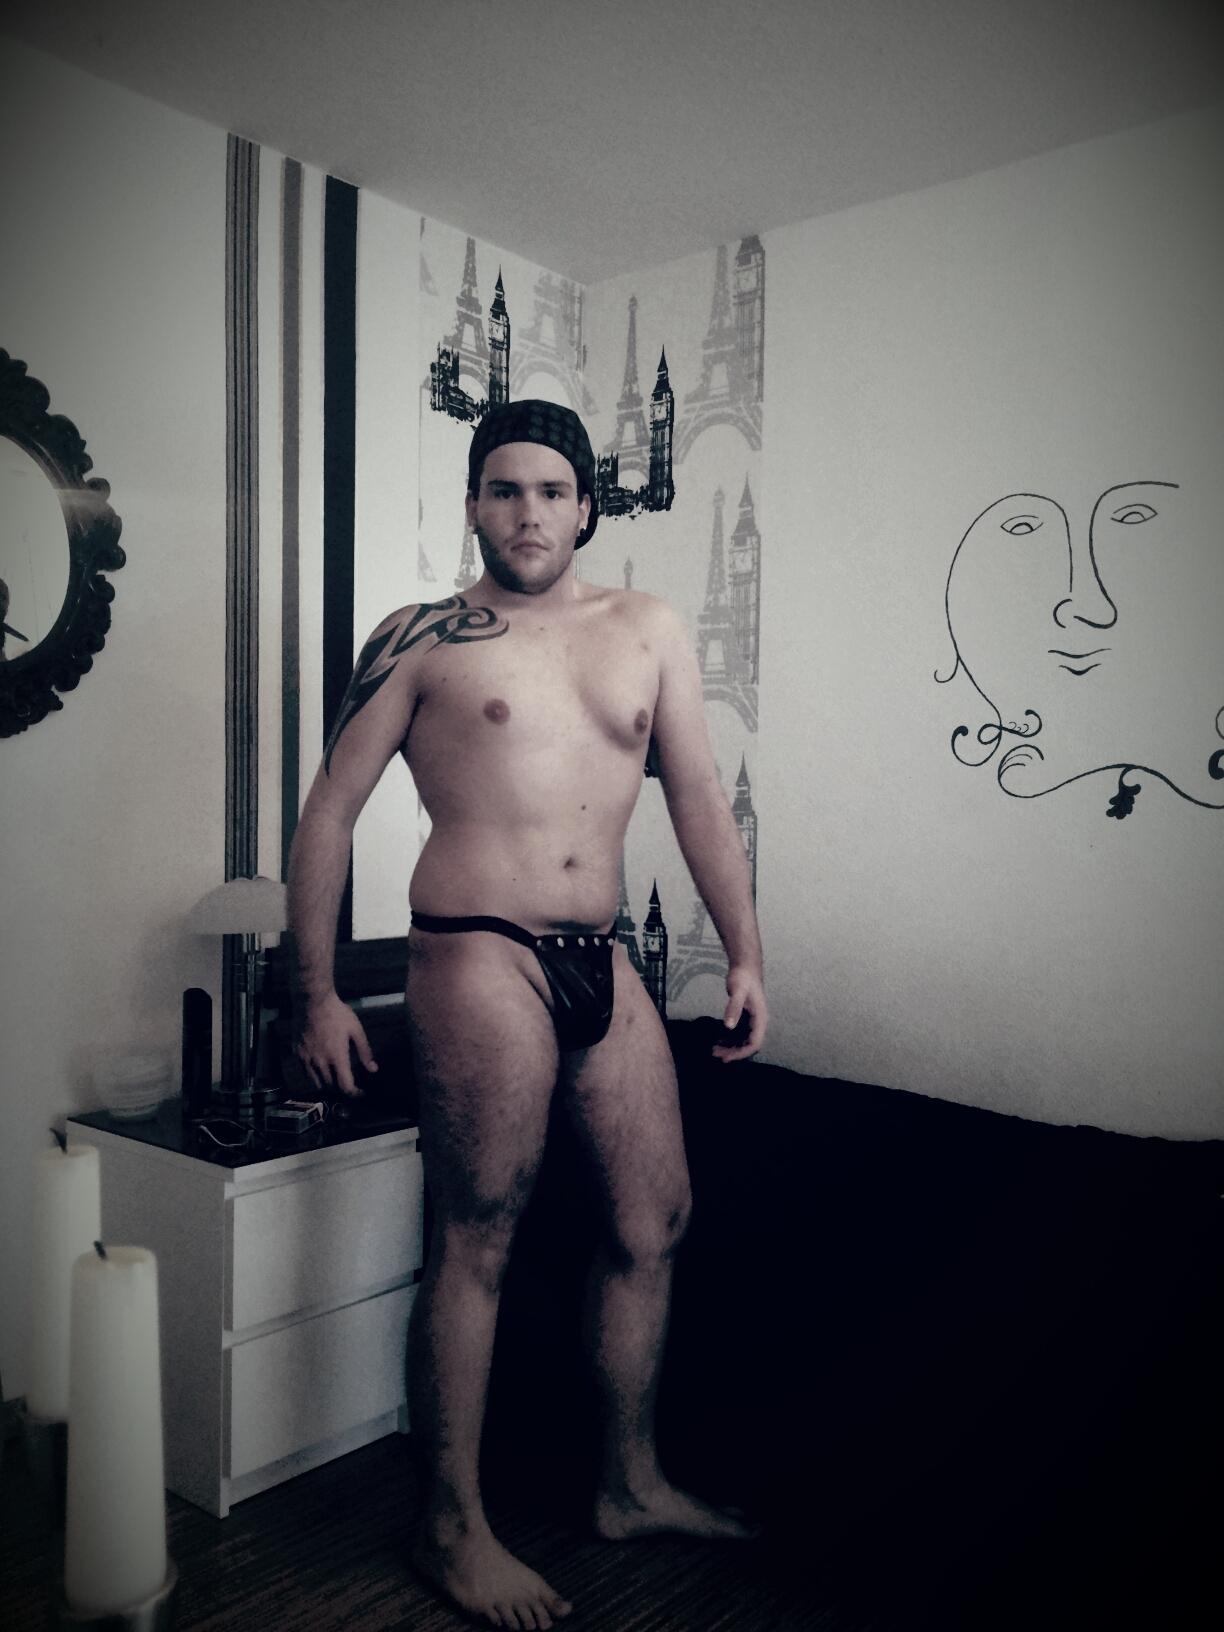 nacktboy123